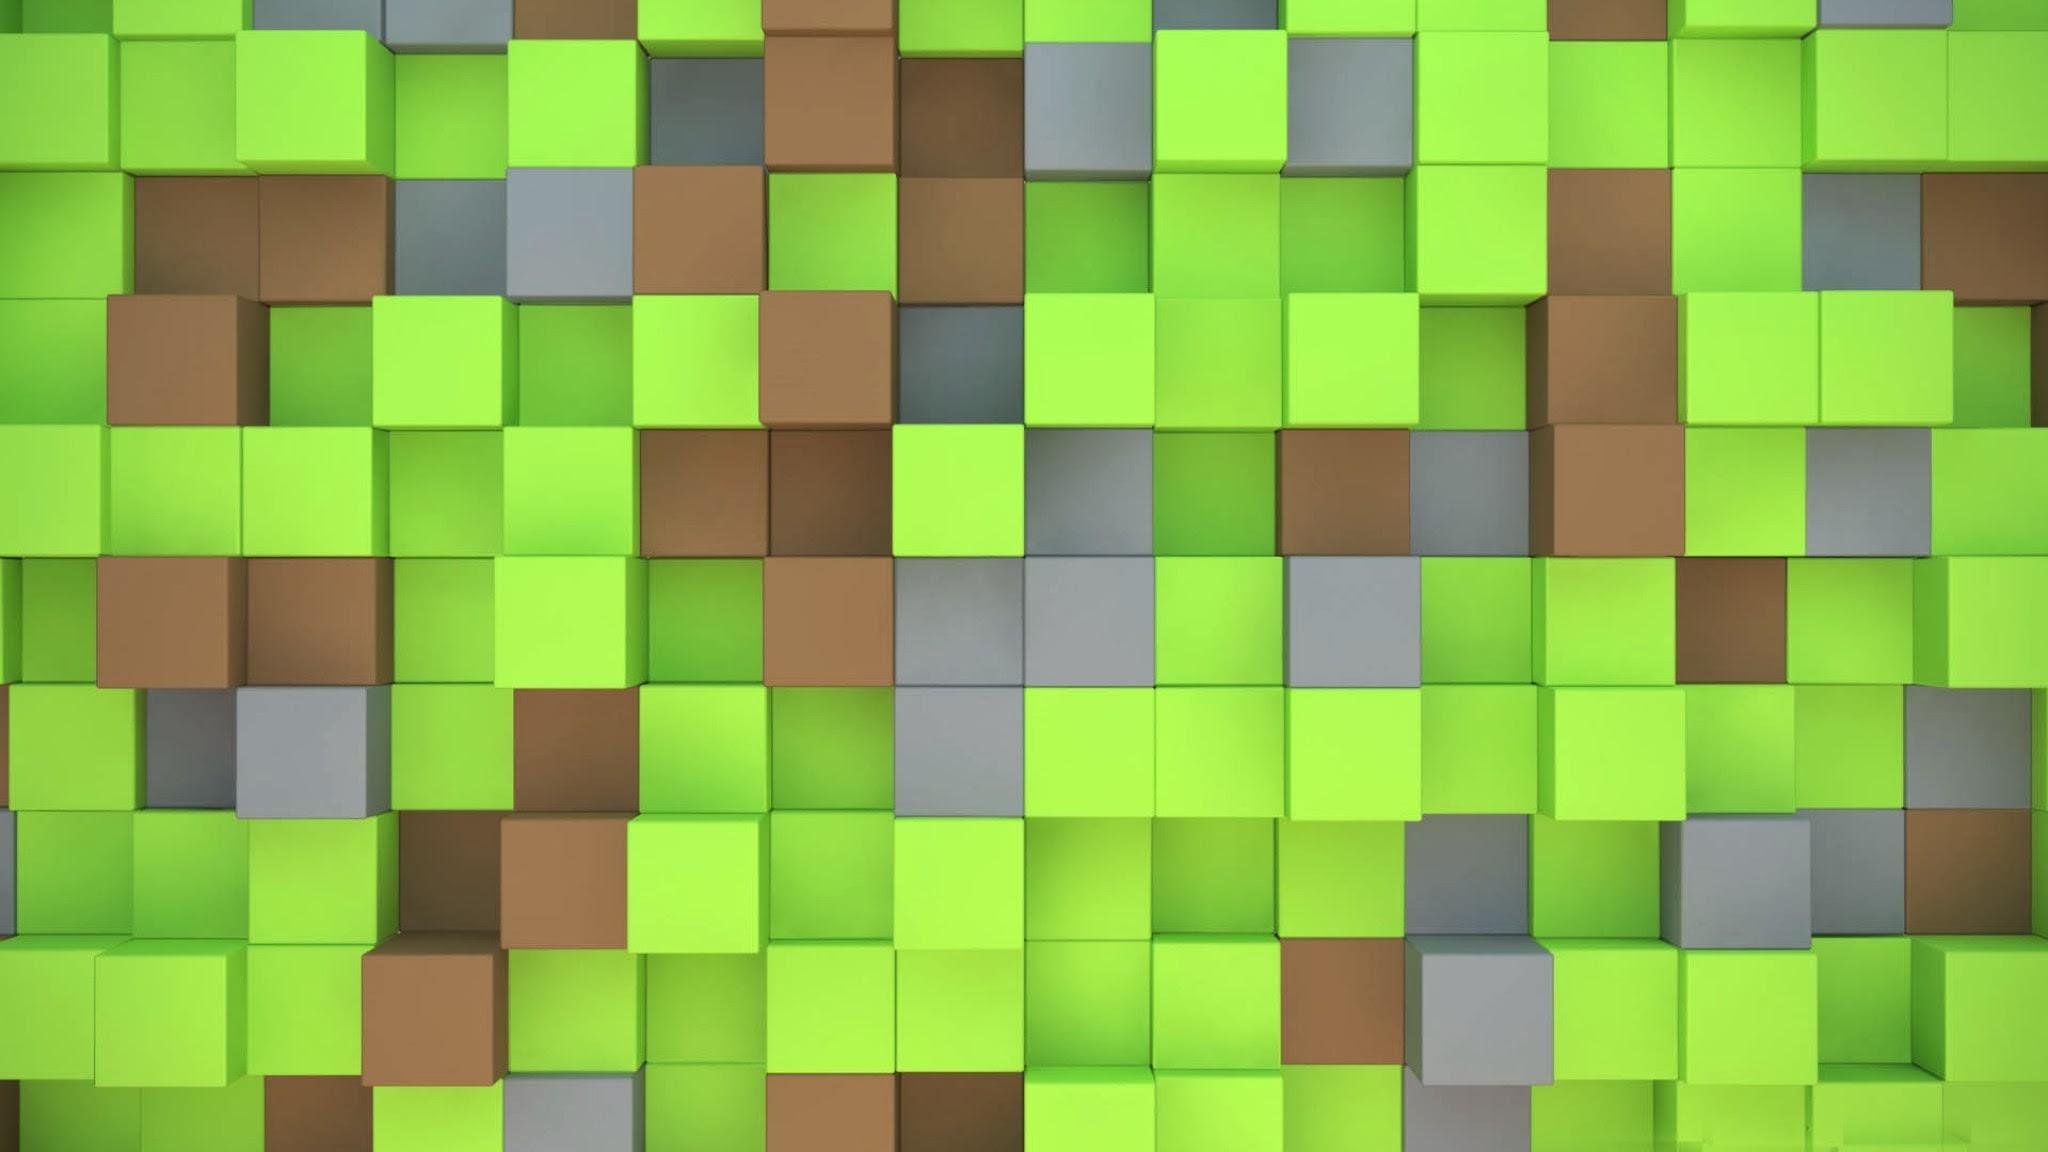 Minecraft Wallpaper 1152x2048 Minecraft cubes 1152x2048jpg 2048x1152